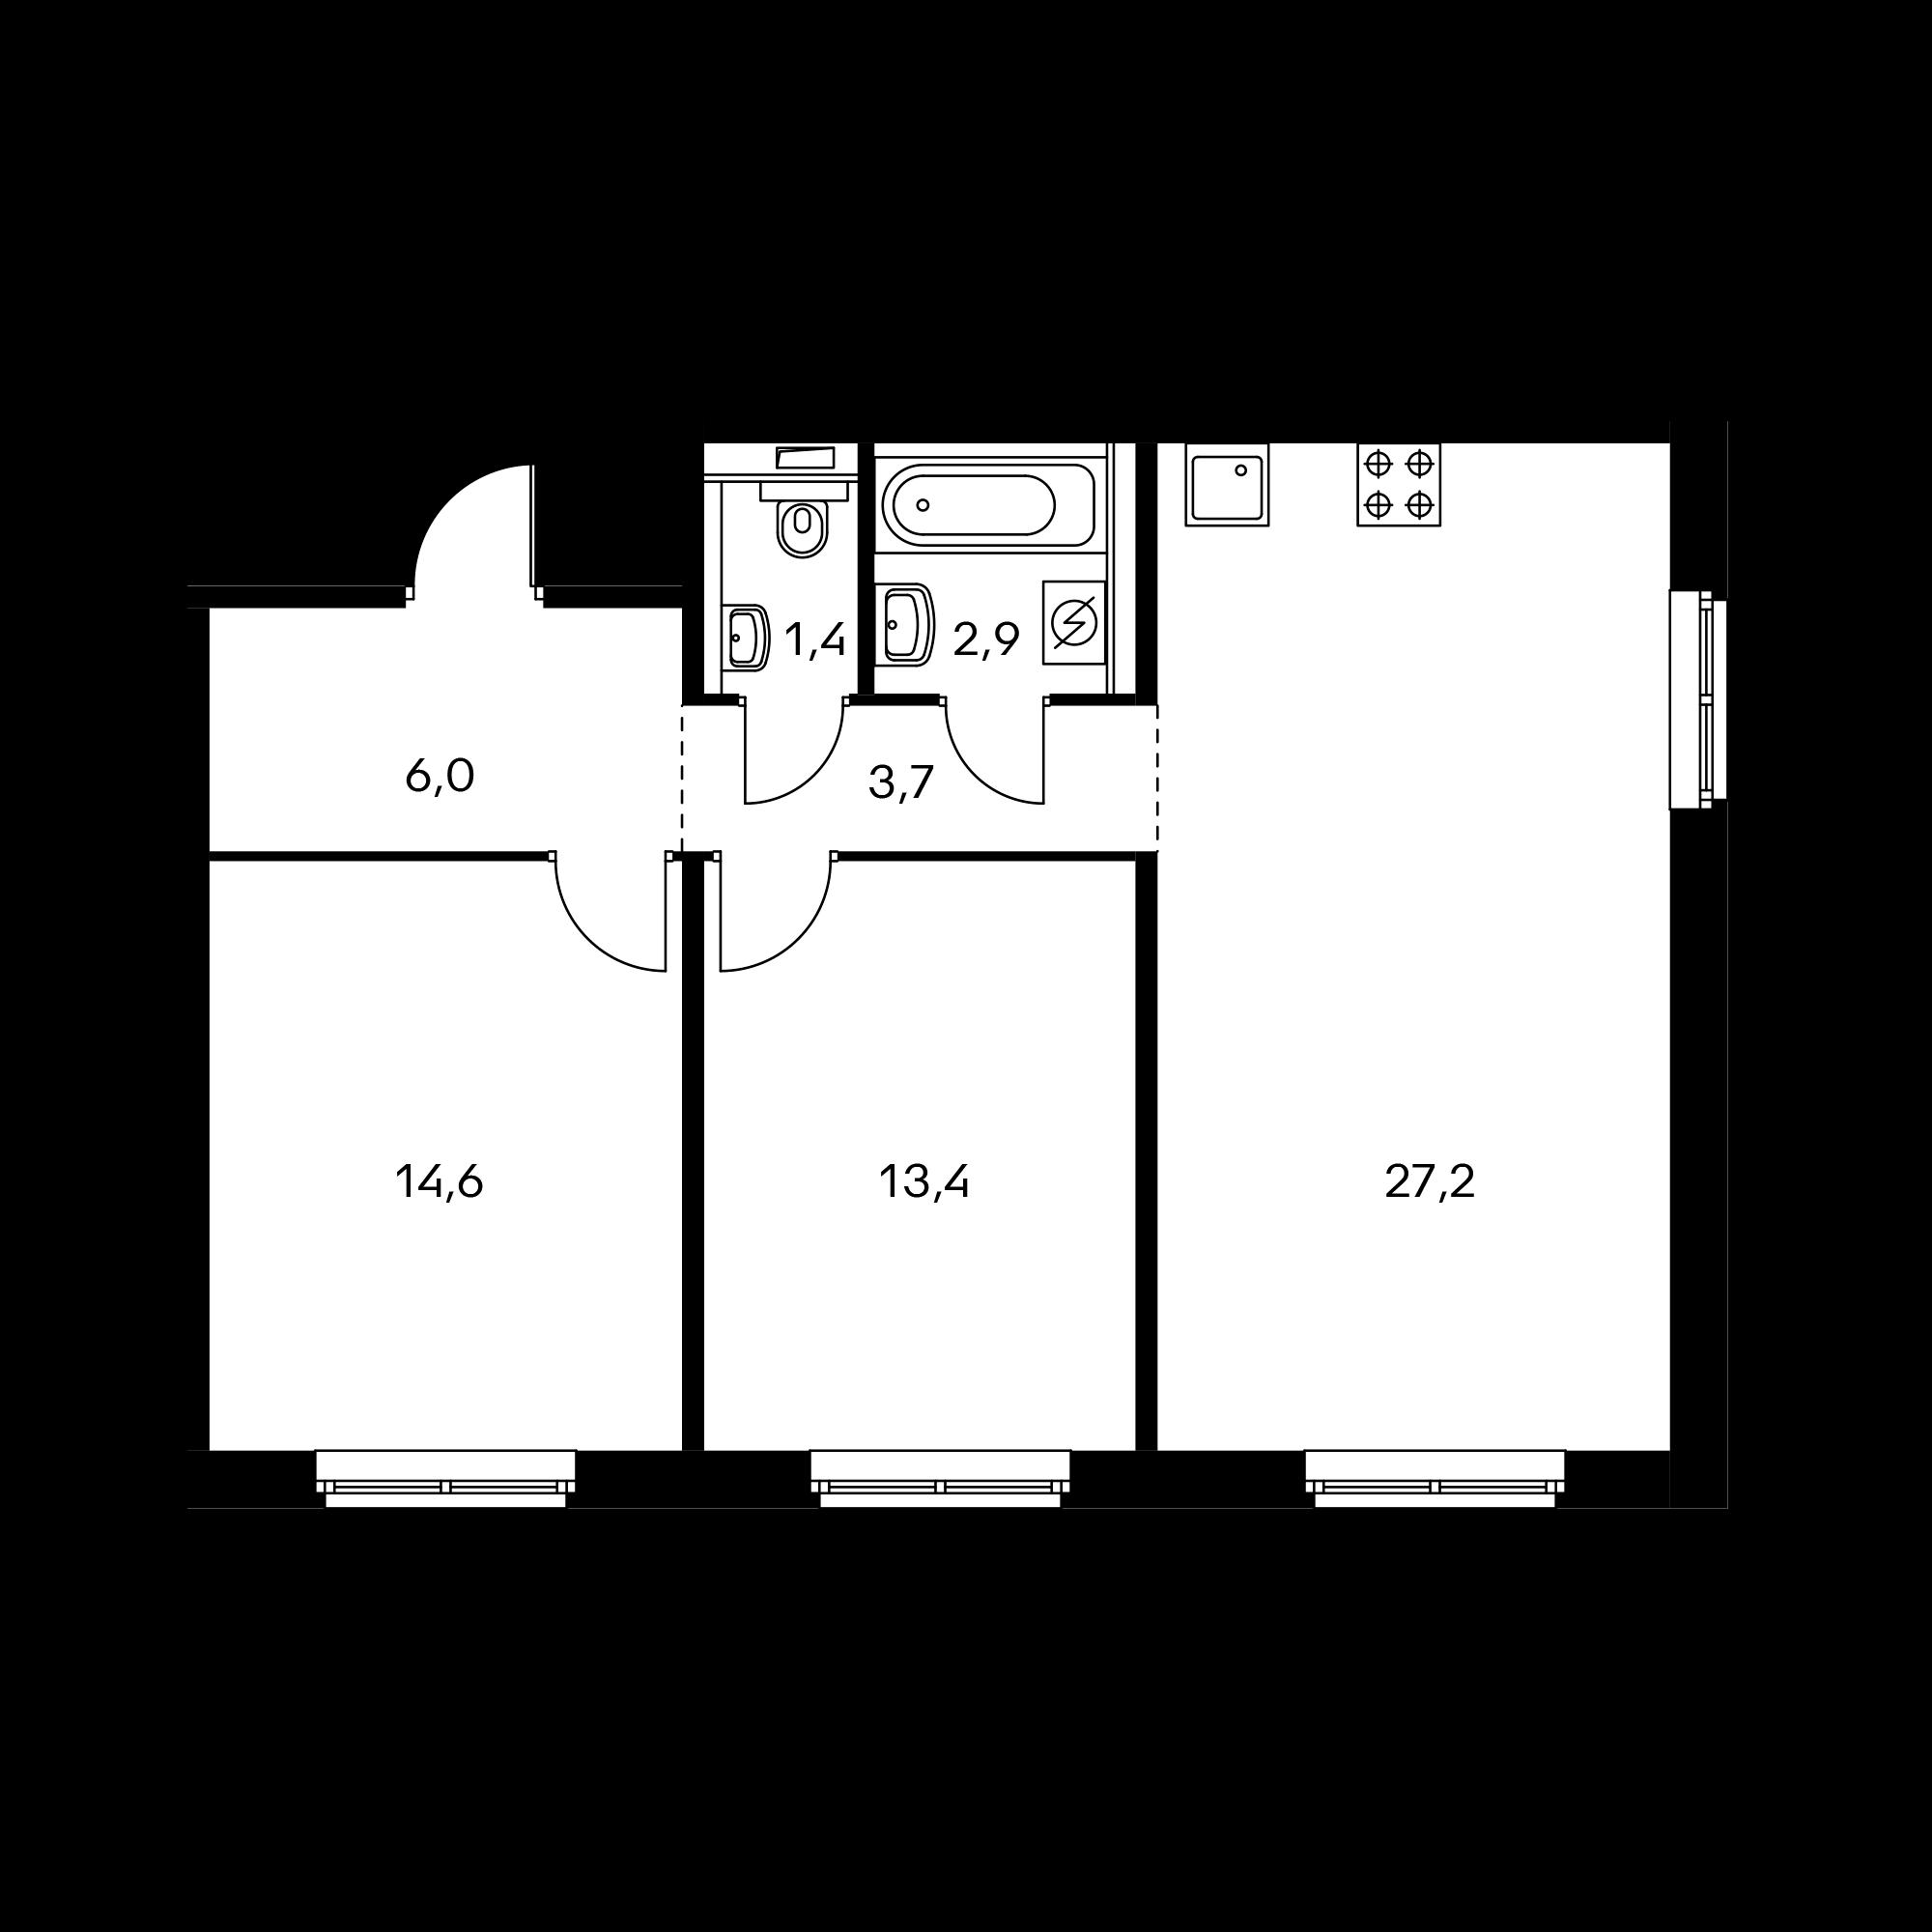 2EL5_10.8-1*